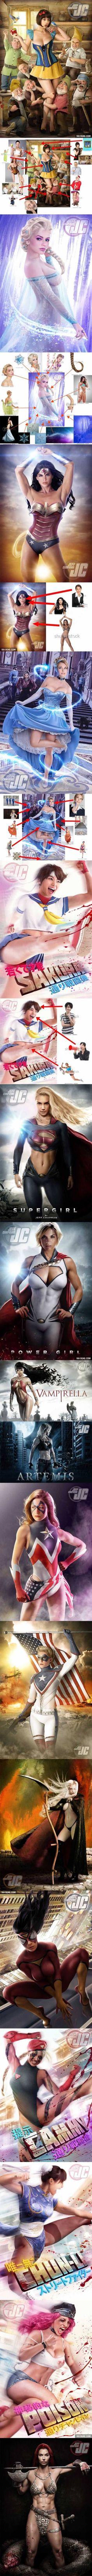 I love superheroes